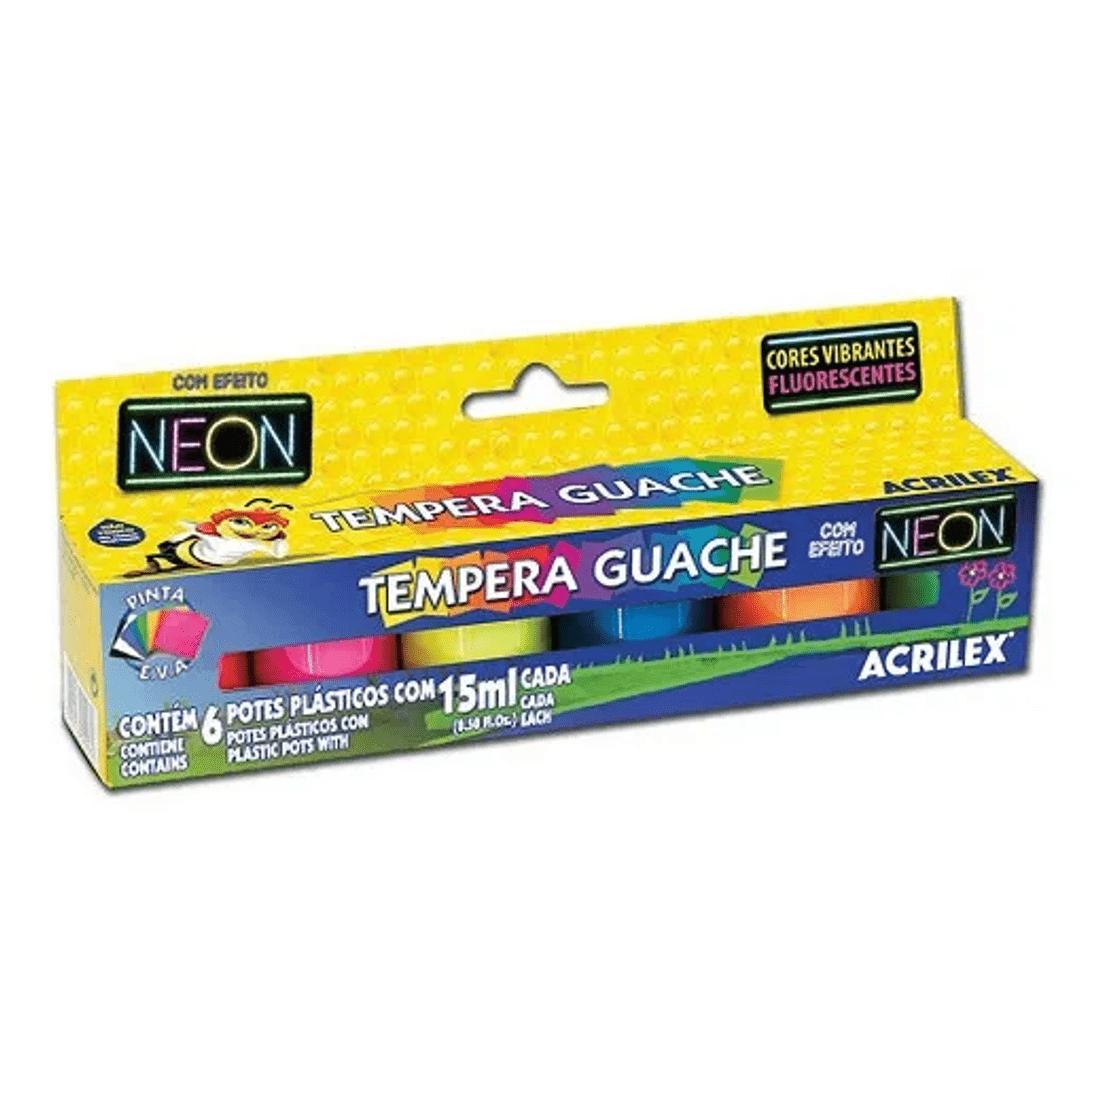 Kit-3-Tinta-Tempera-Guache-15ml-cada-com-6-Cores-Neon-01006-Acrilex